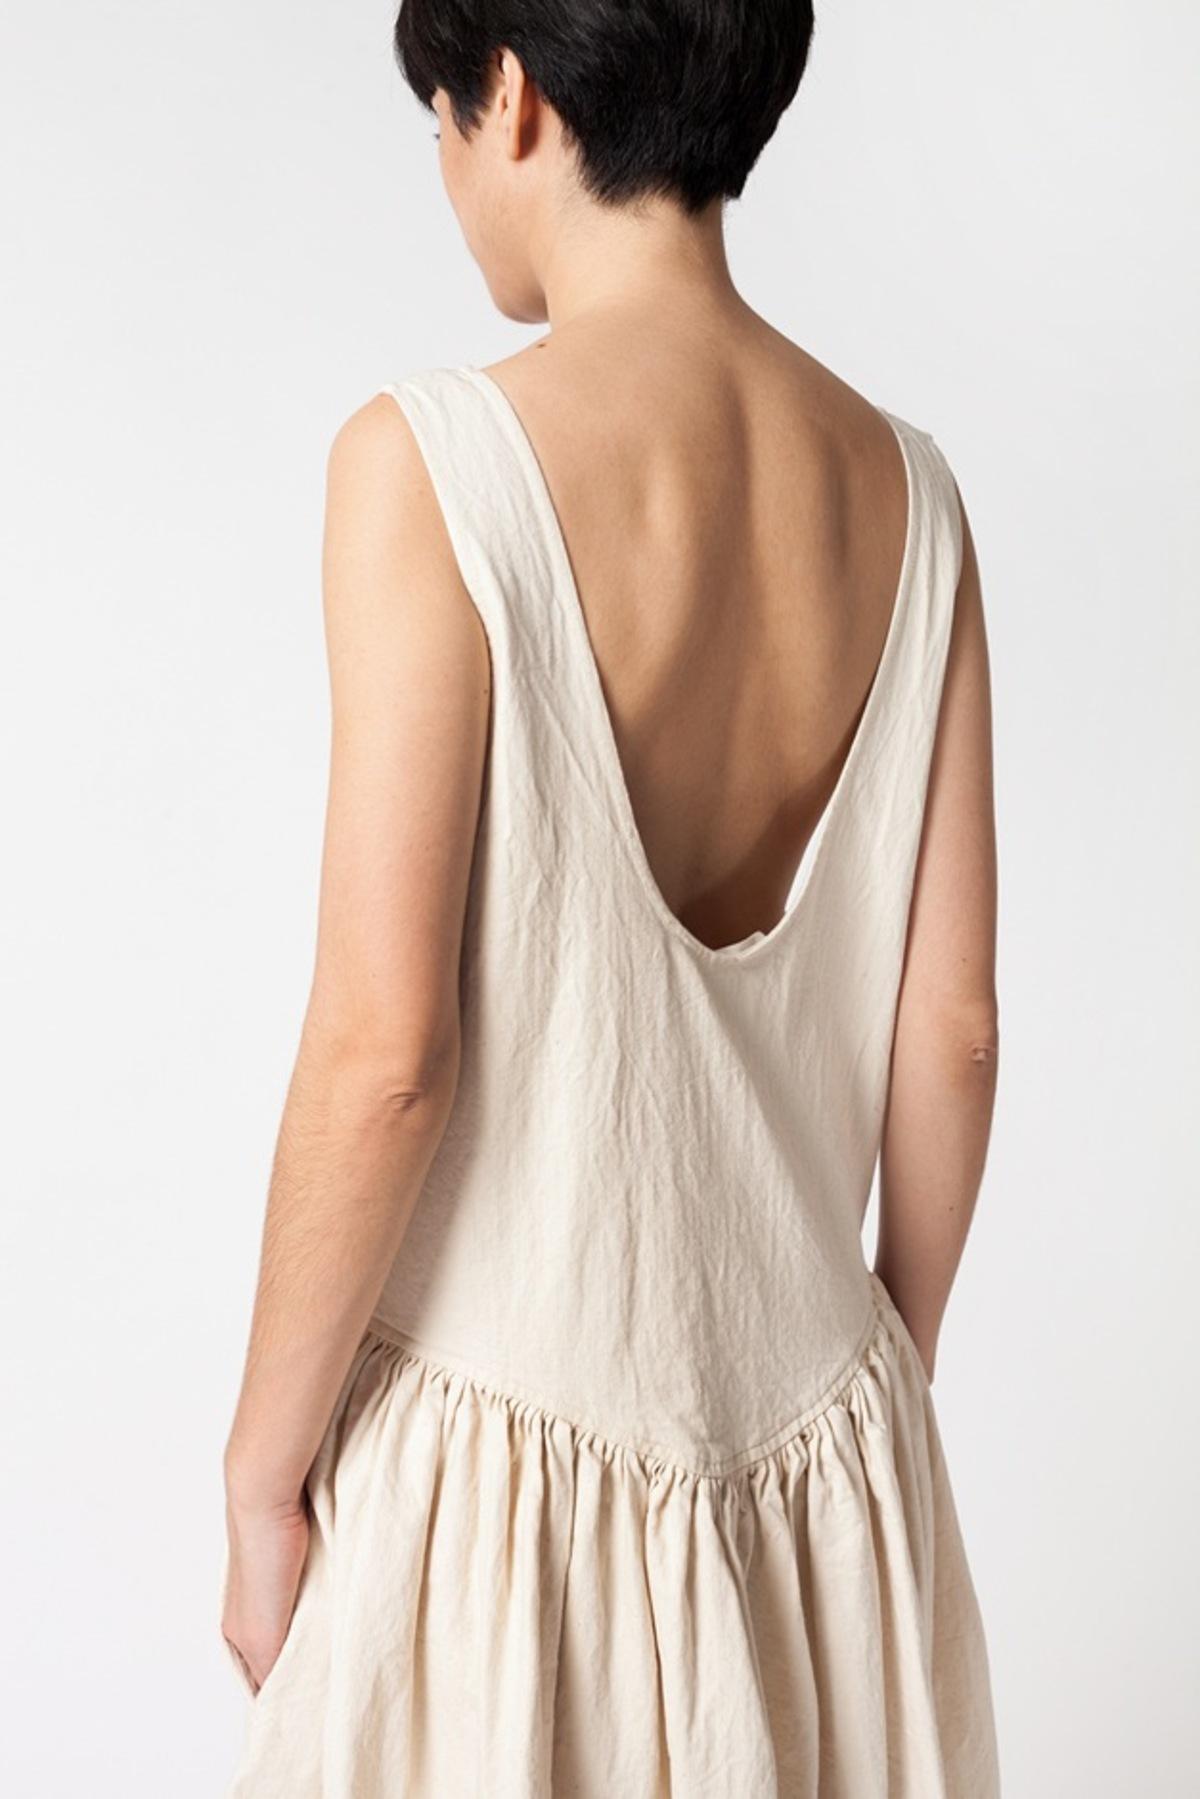 Creatures of Comfort Carine Dress - natural | Garmentory